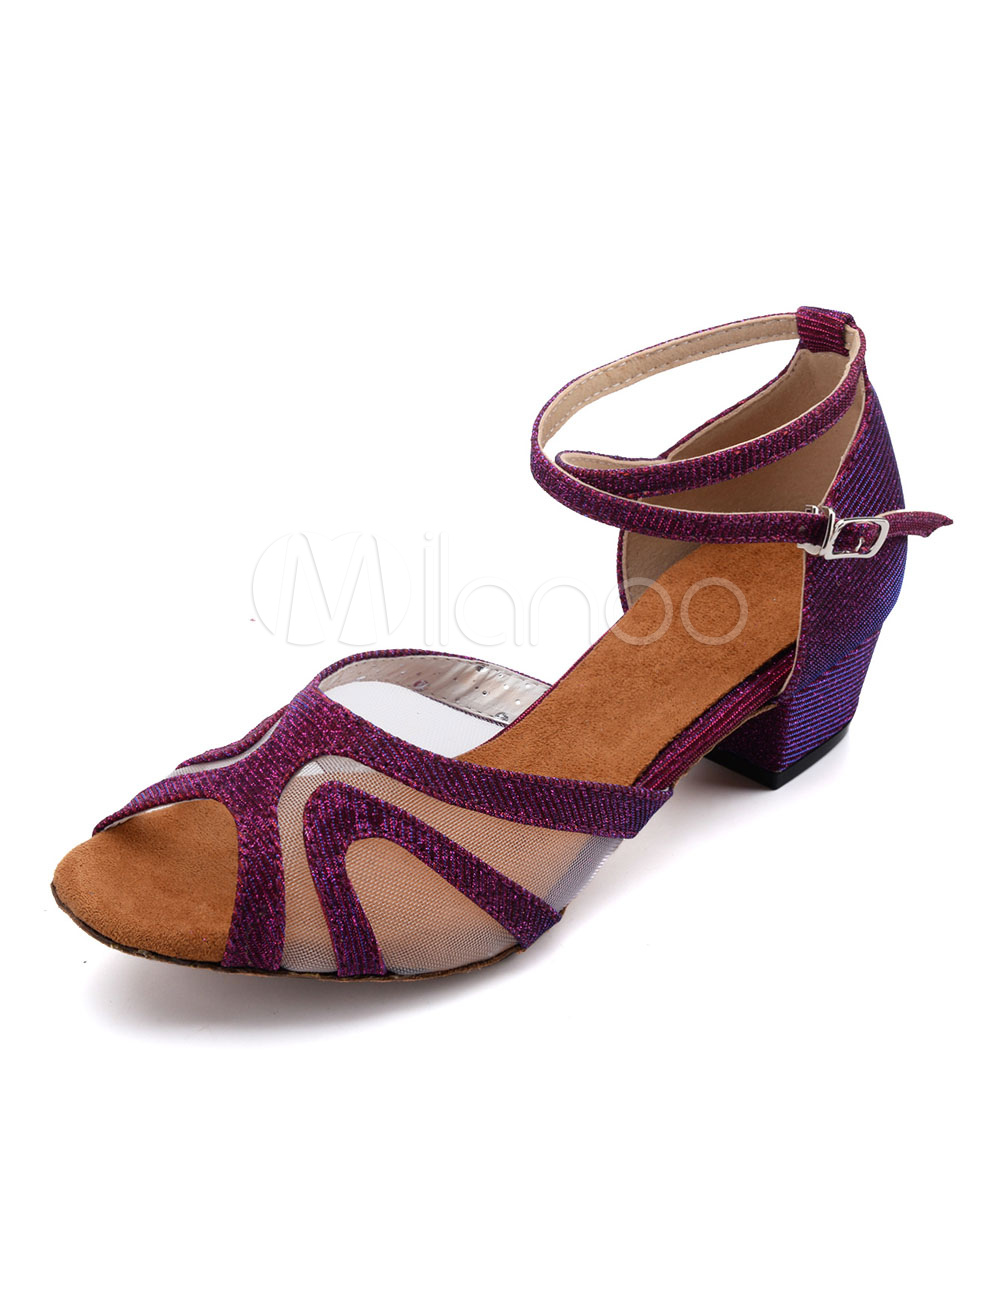 Latin Dance Shoes Glitter Peep Toe Criss Cross Ballroom Dance Shoes Salsa Dance Shoes